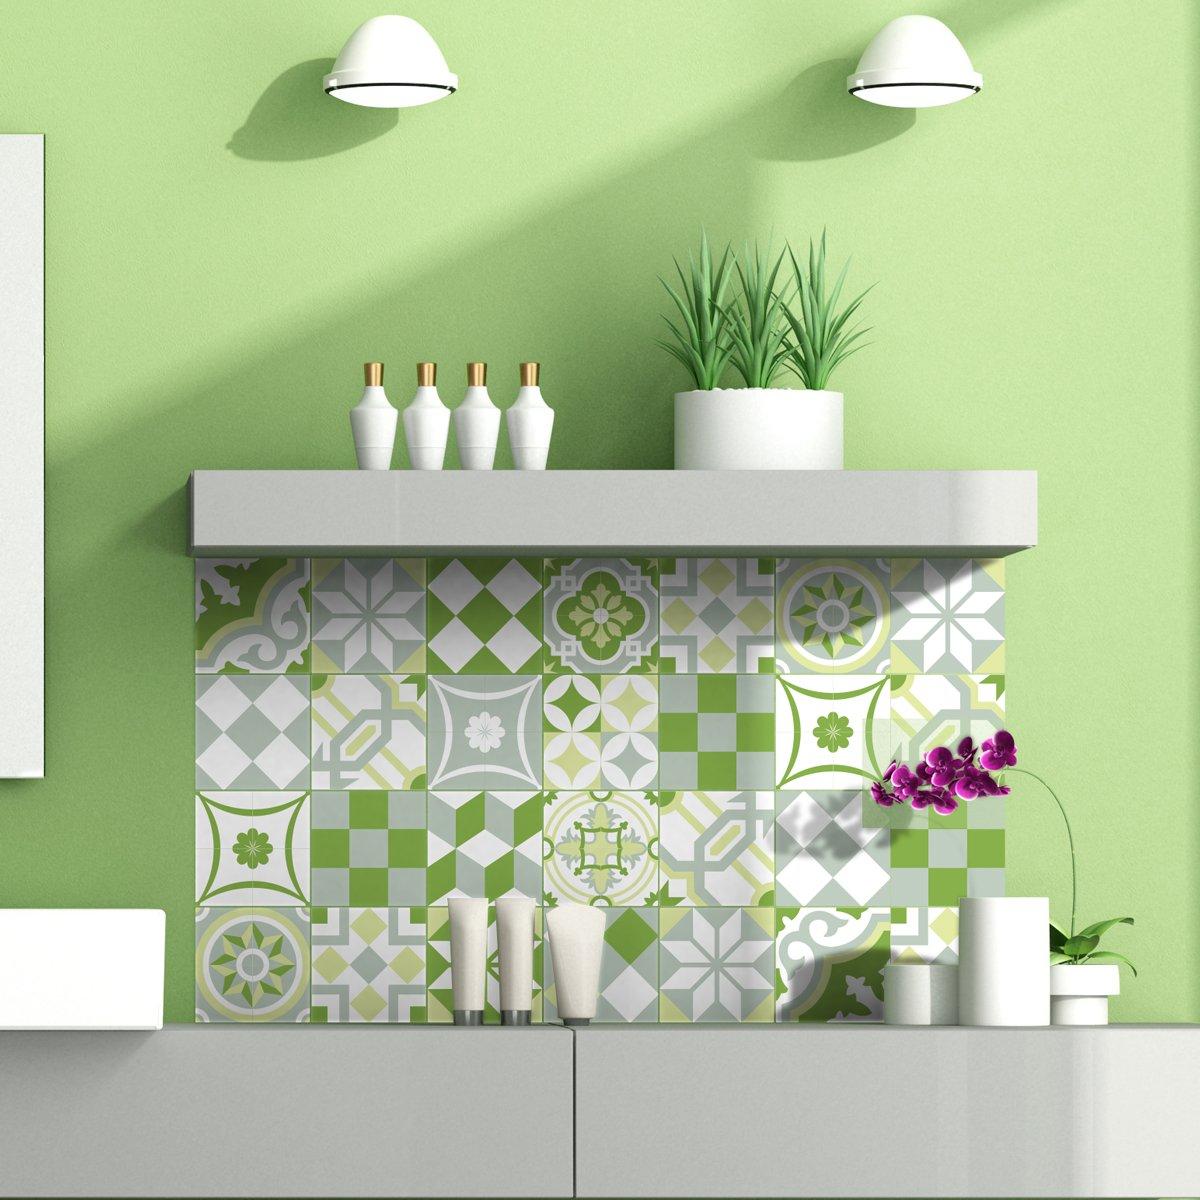 Ambiance-Live 24adesivi adesivi piastrelle | Adesivo Piastrelle–Mosaico Piastrelle a Parete Bagno e Cucina | Piastrelle Adesivo–Patchwork Verde–10x 10cm–24pezzi